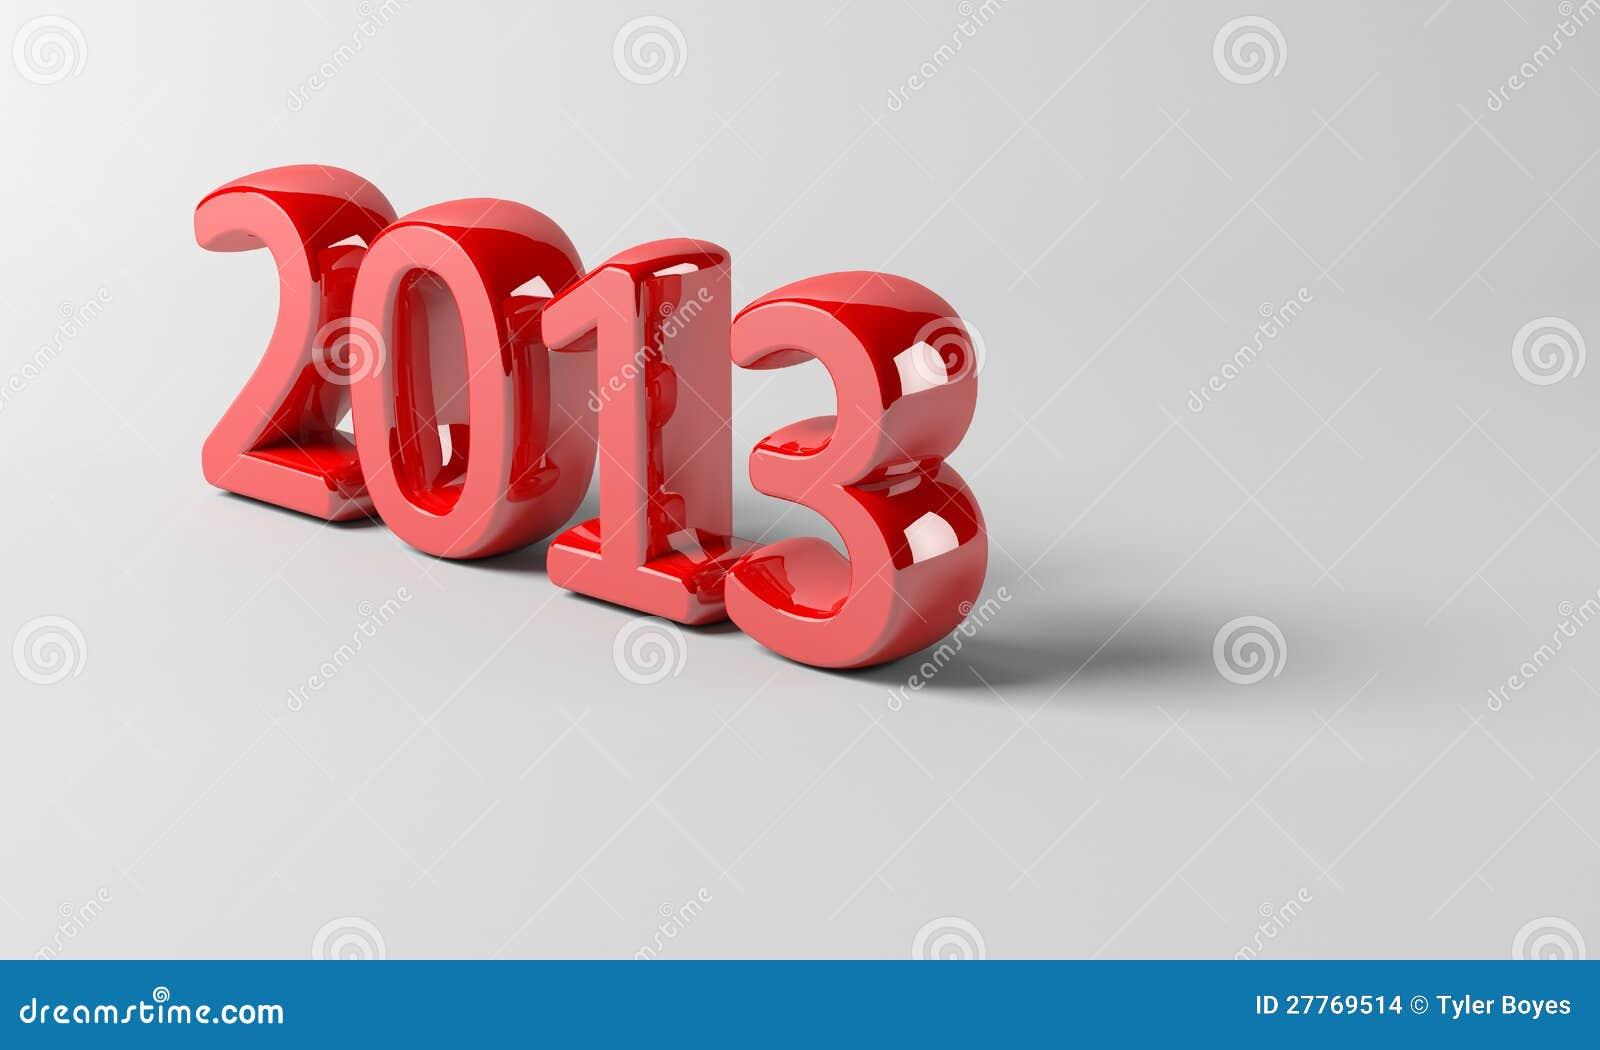 Rendu 2013